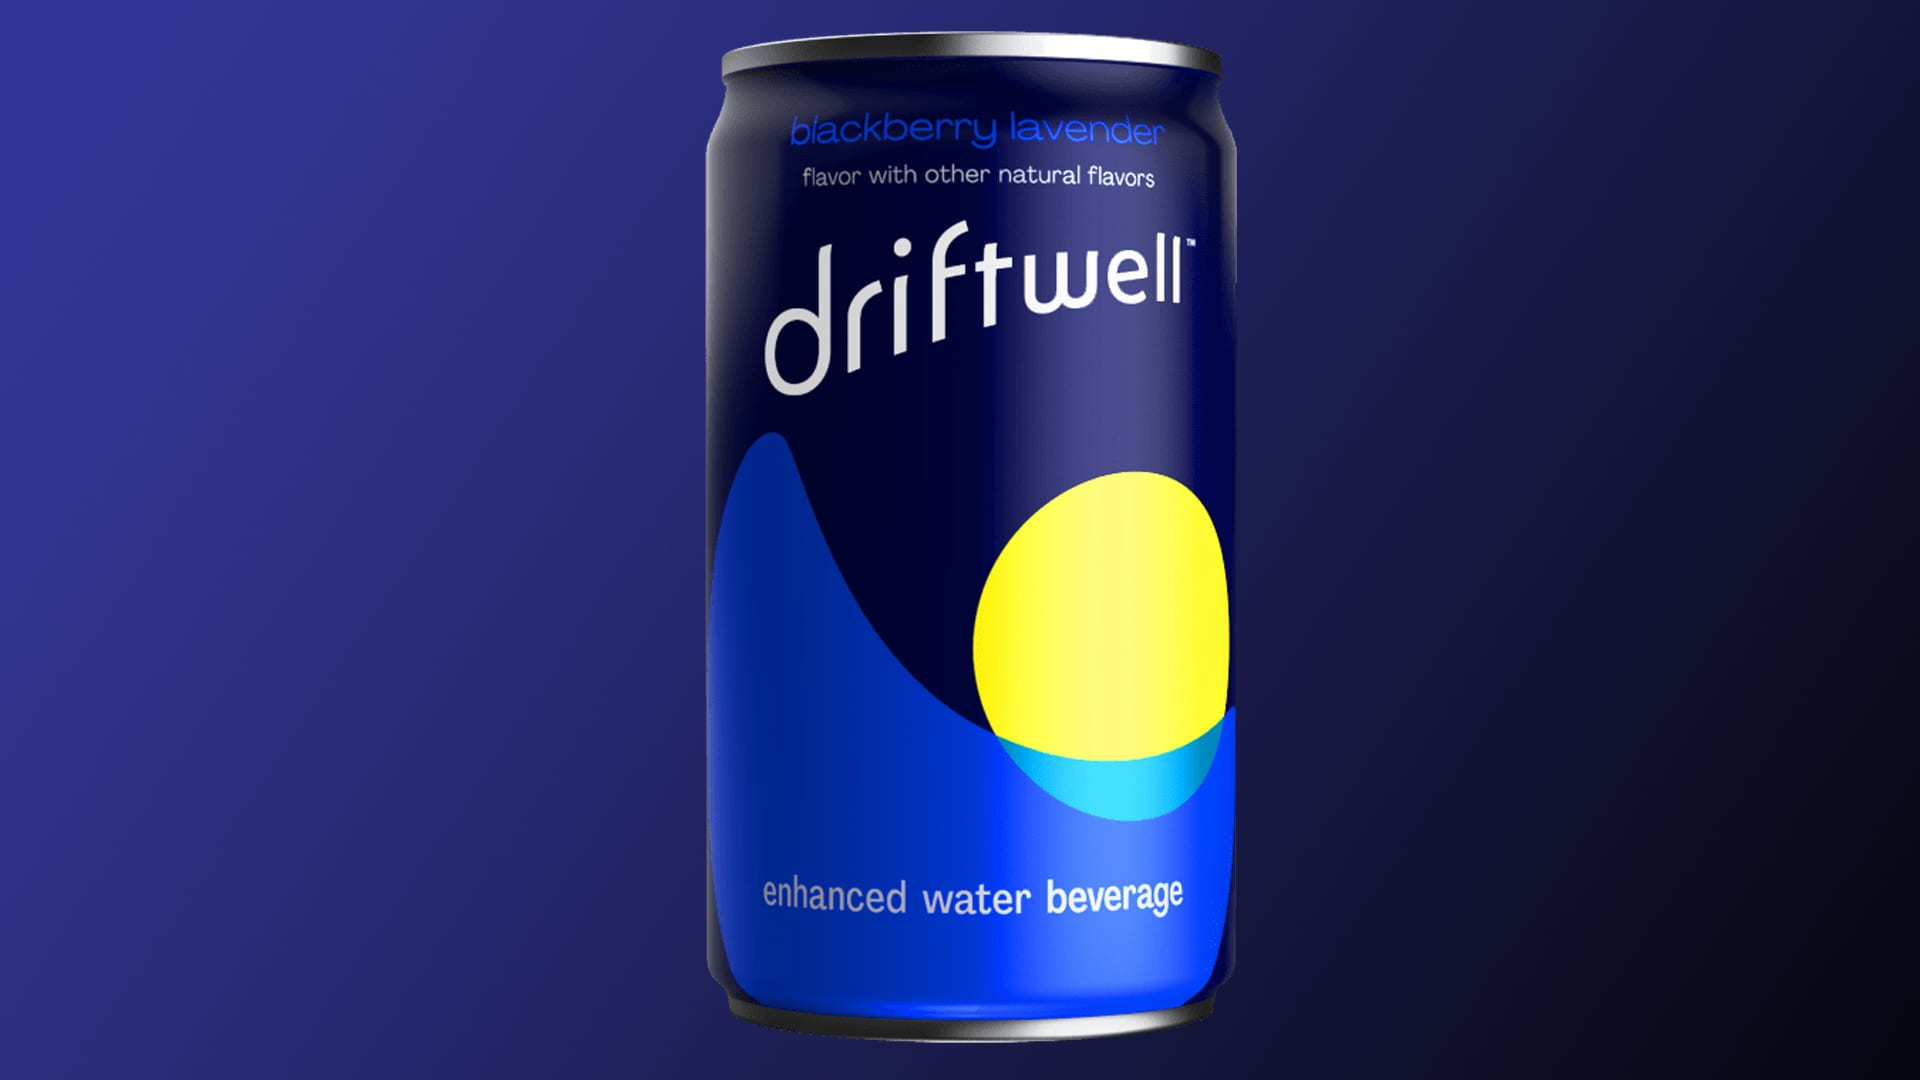 PepsiCo's latest drink, Driftwell